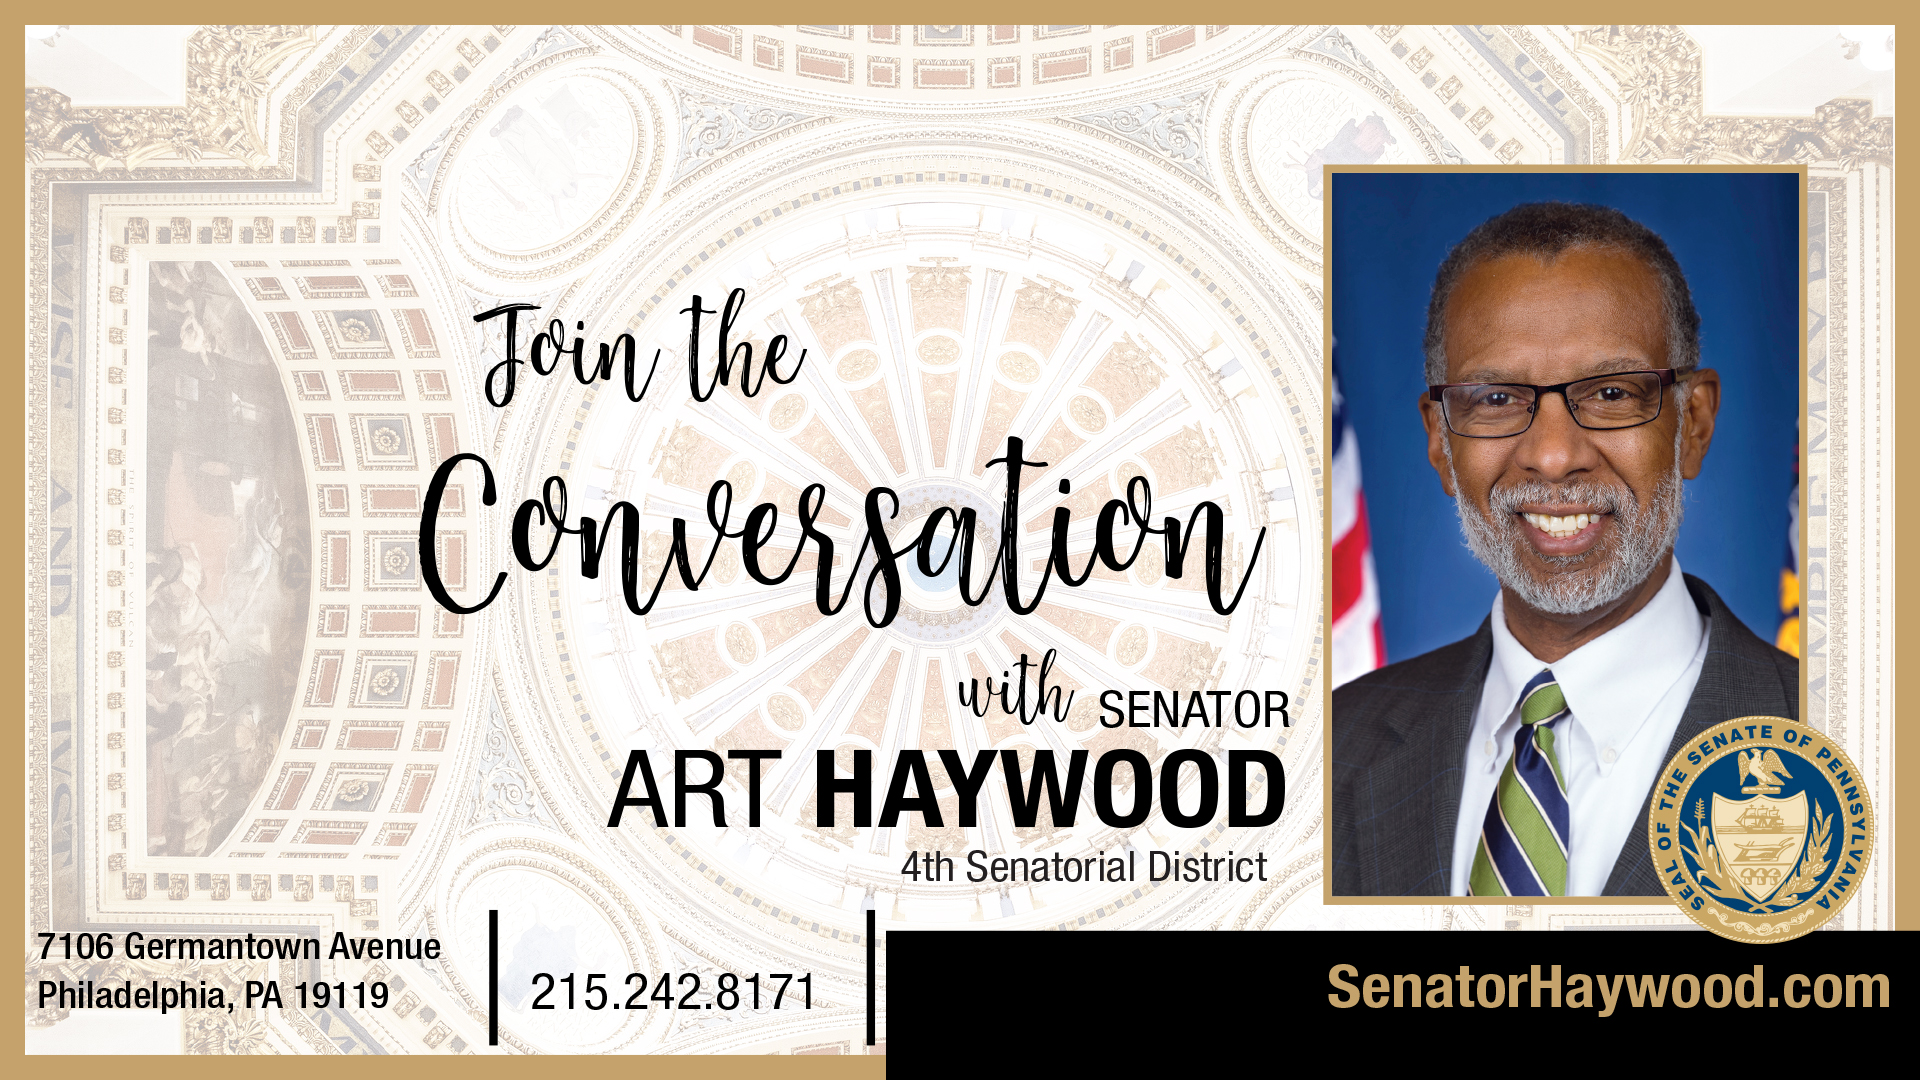 Pennsylvania State Senator Art Haywood